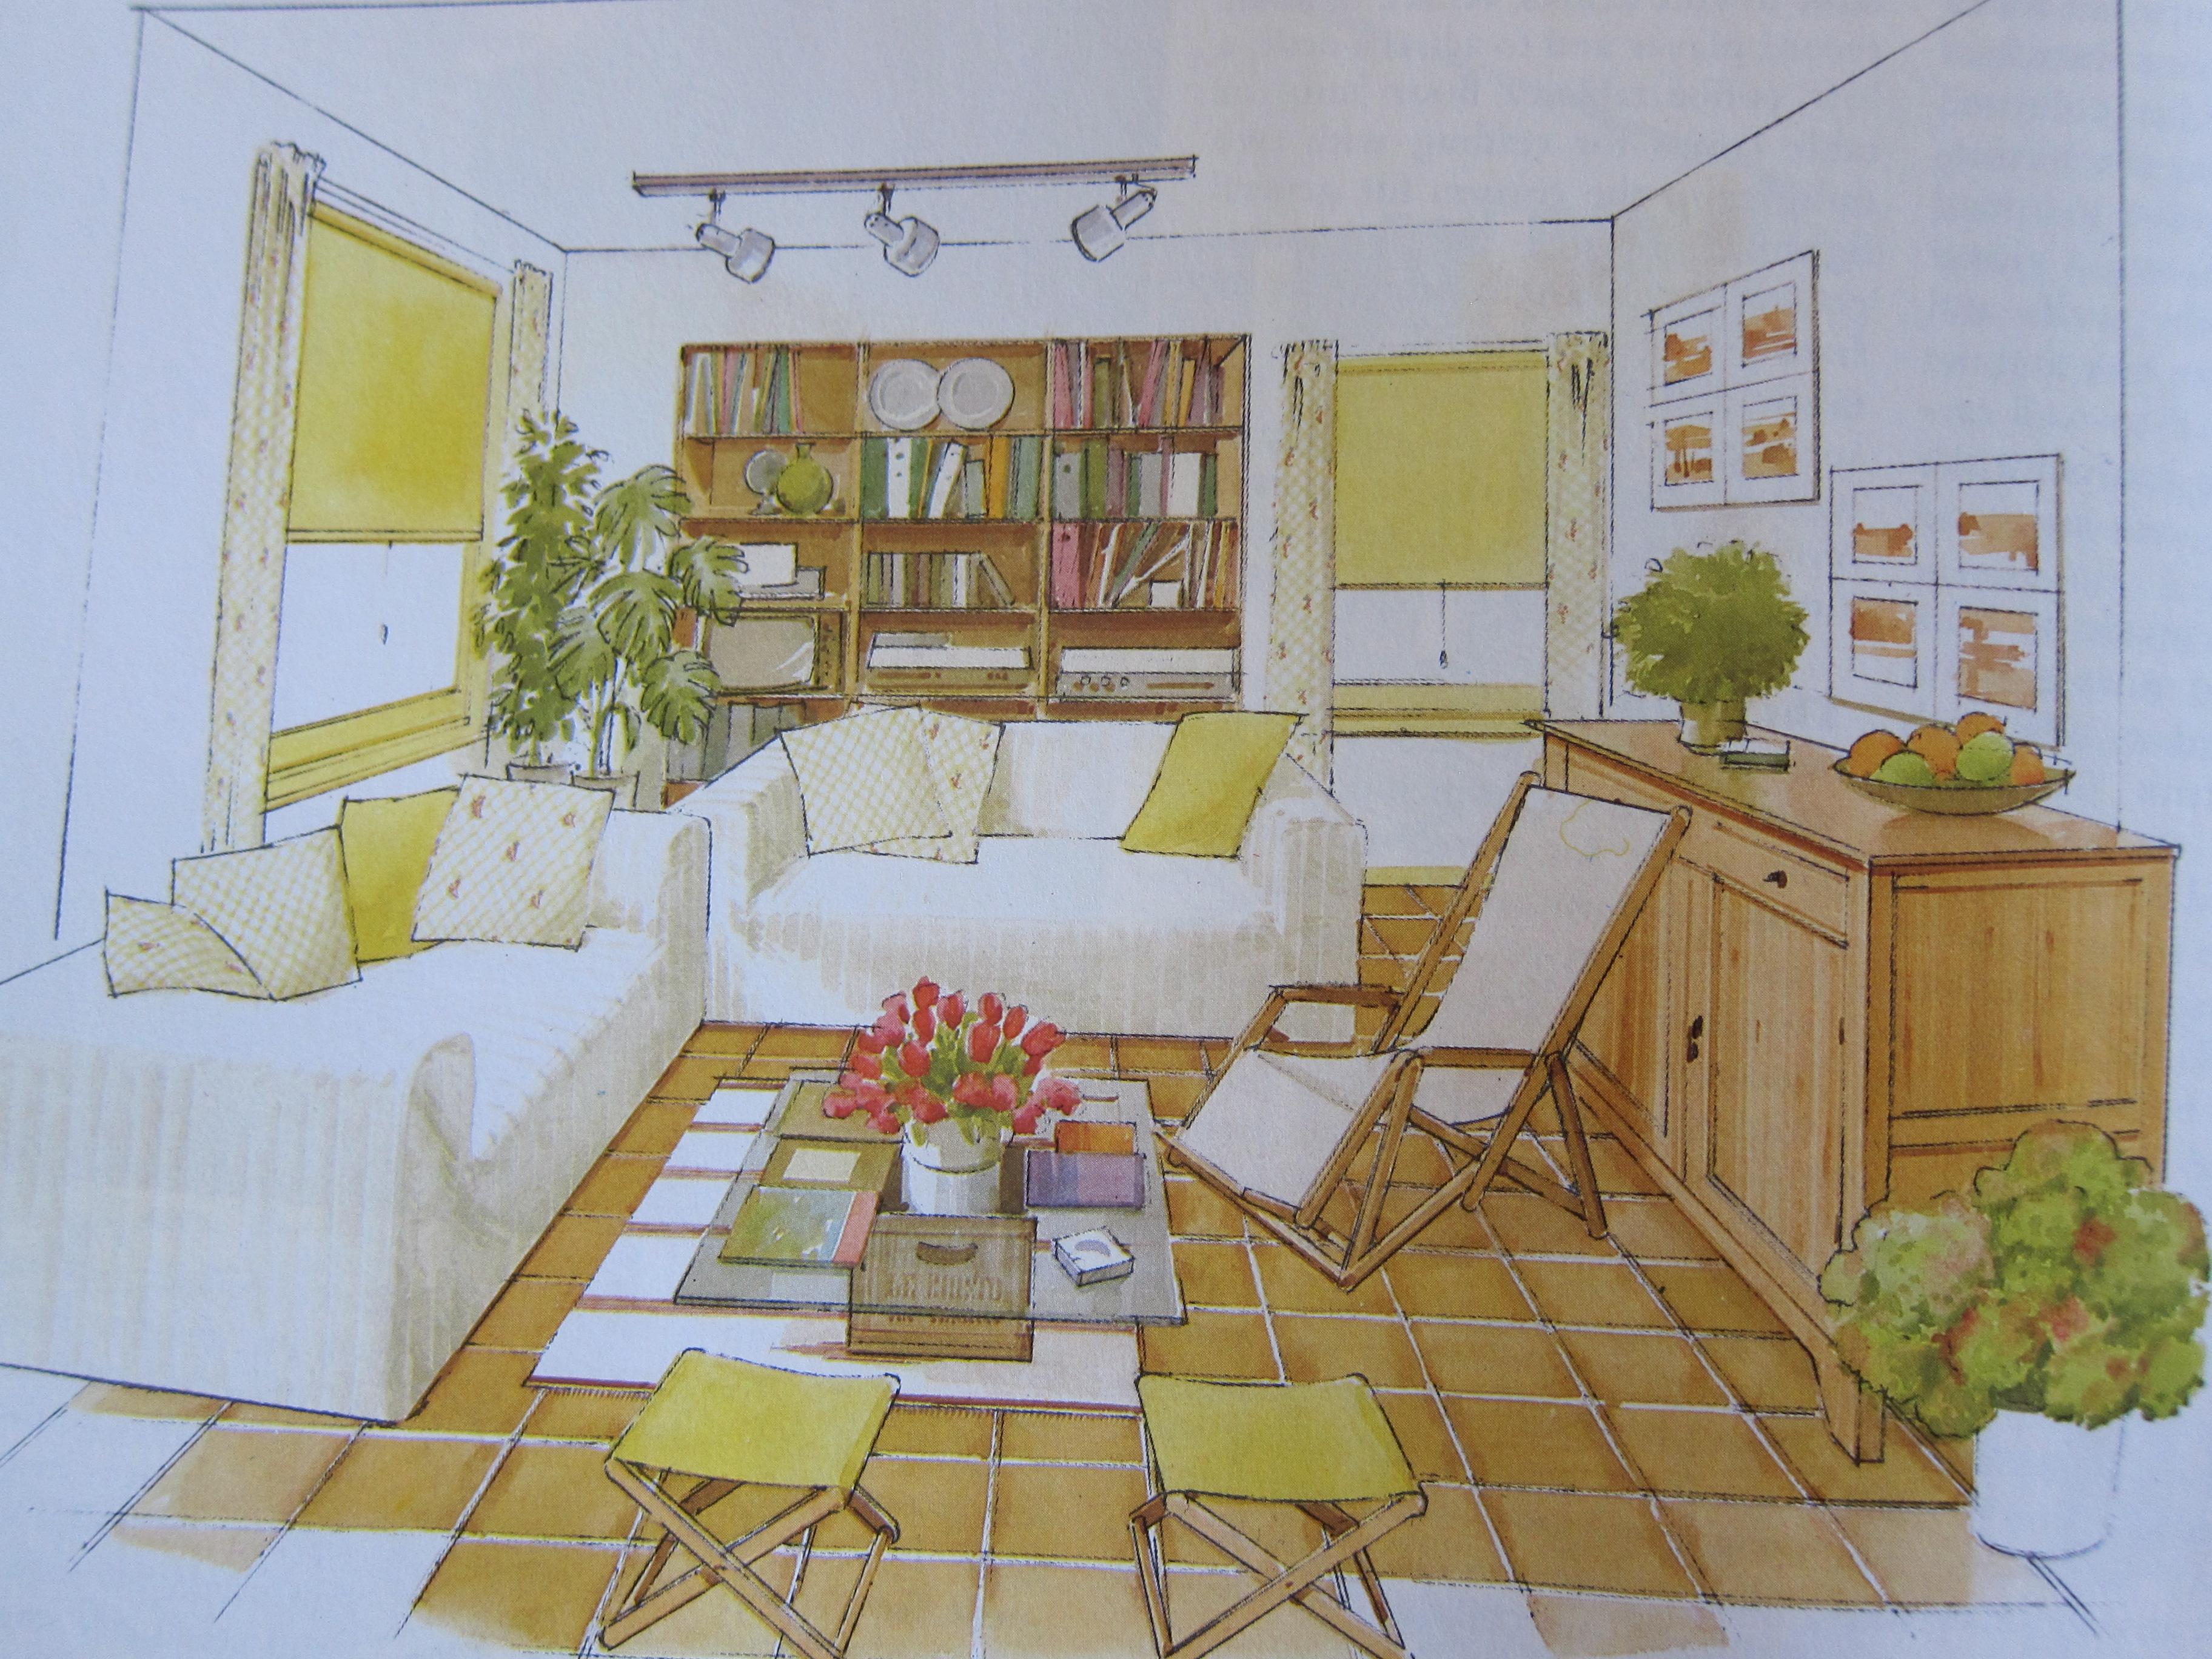 Interior Design Rendering from 1980s